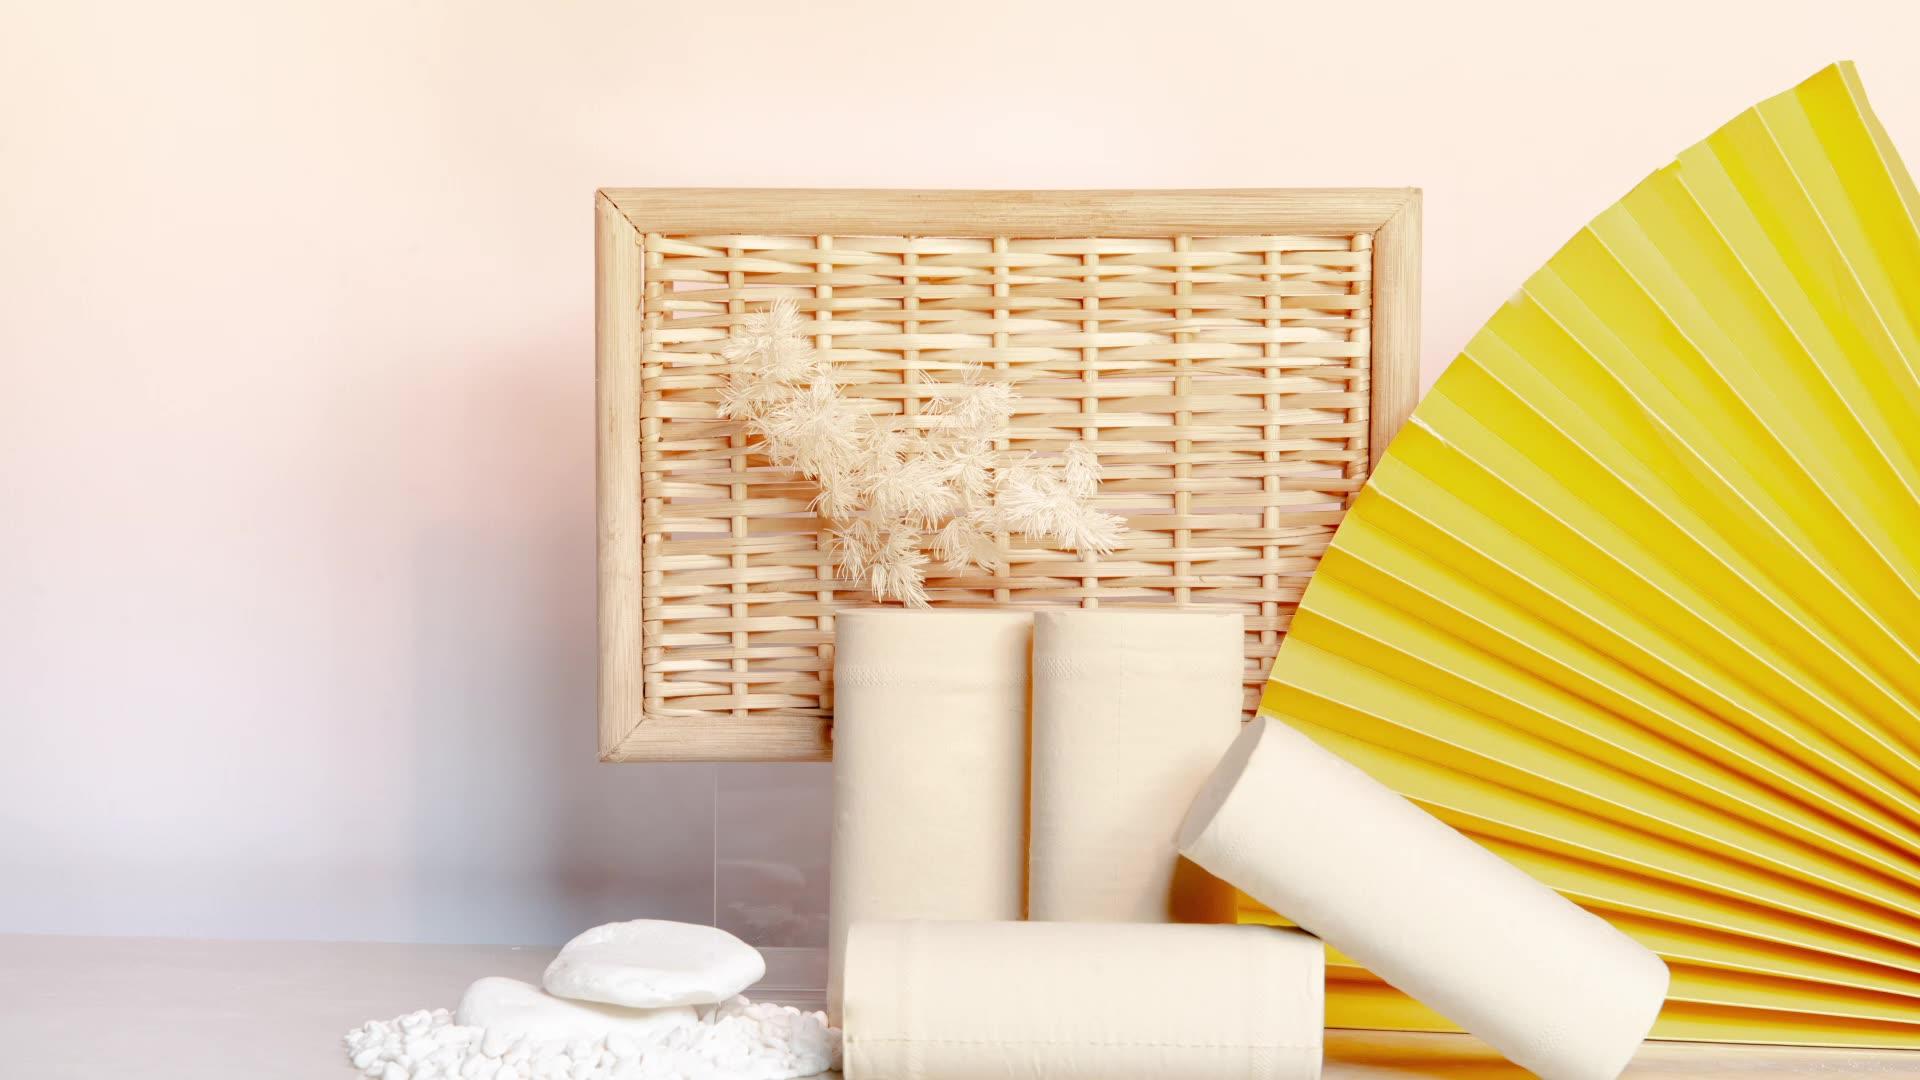 Sinopec Groep Fit Huid Import Fabriek Prijs Bamboe Toiletpapier Roll